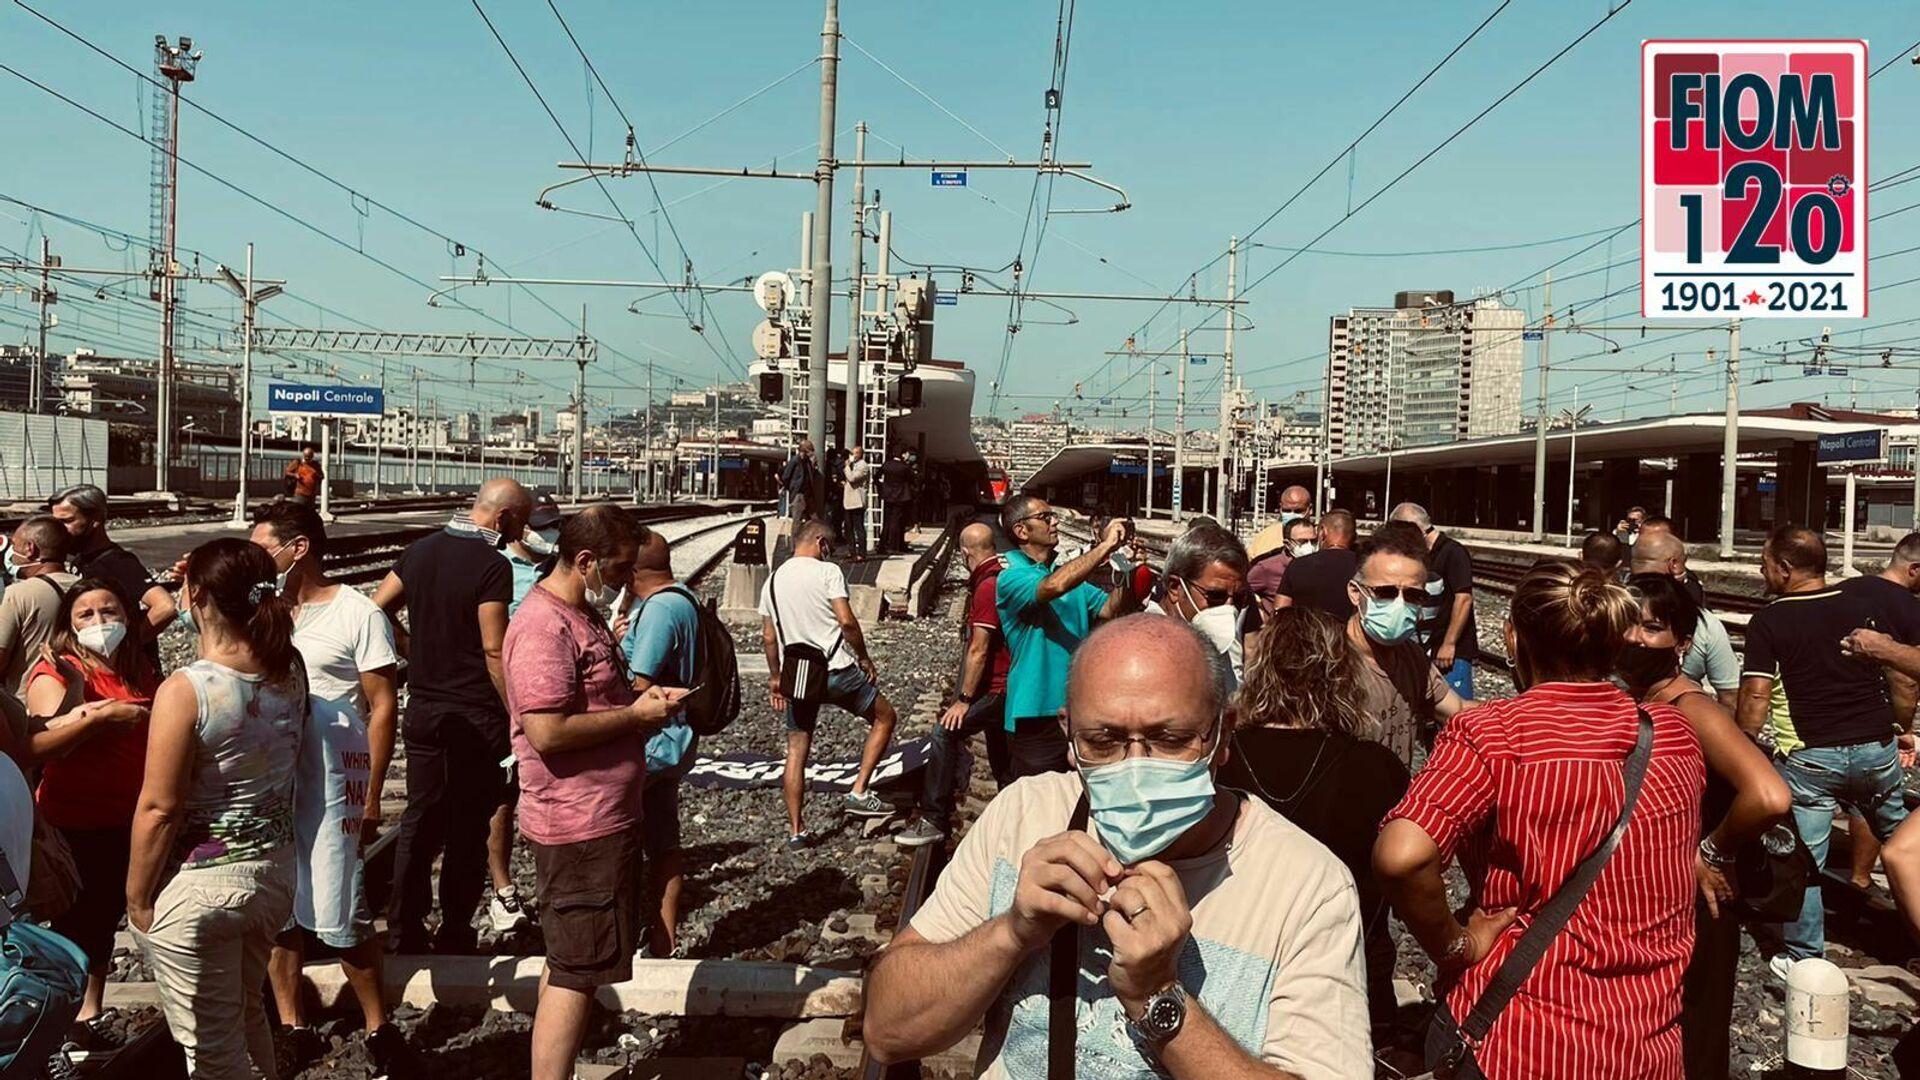 Protesta lavoratori Whirlpool Napoli - Sputnik Italia, 1920, 20.07.2021